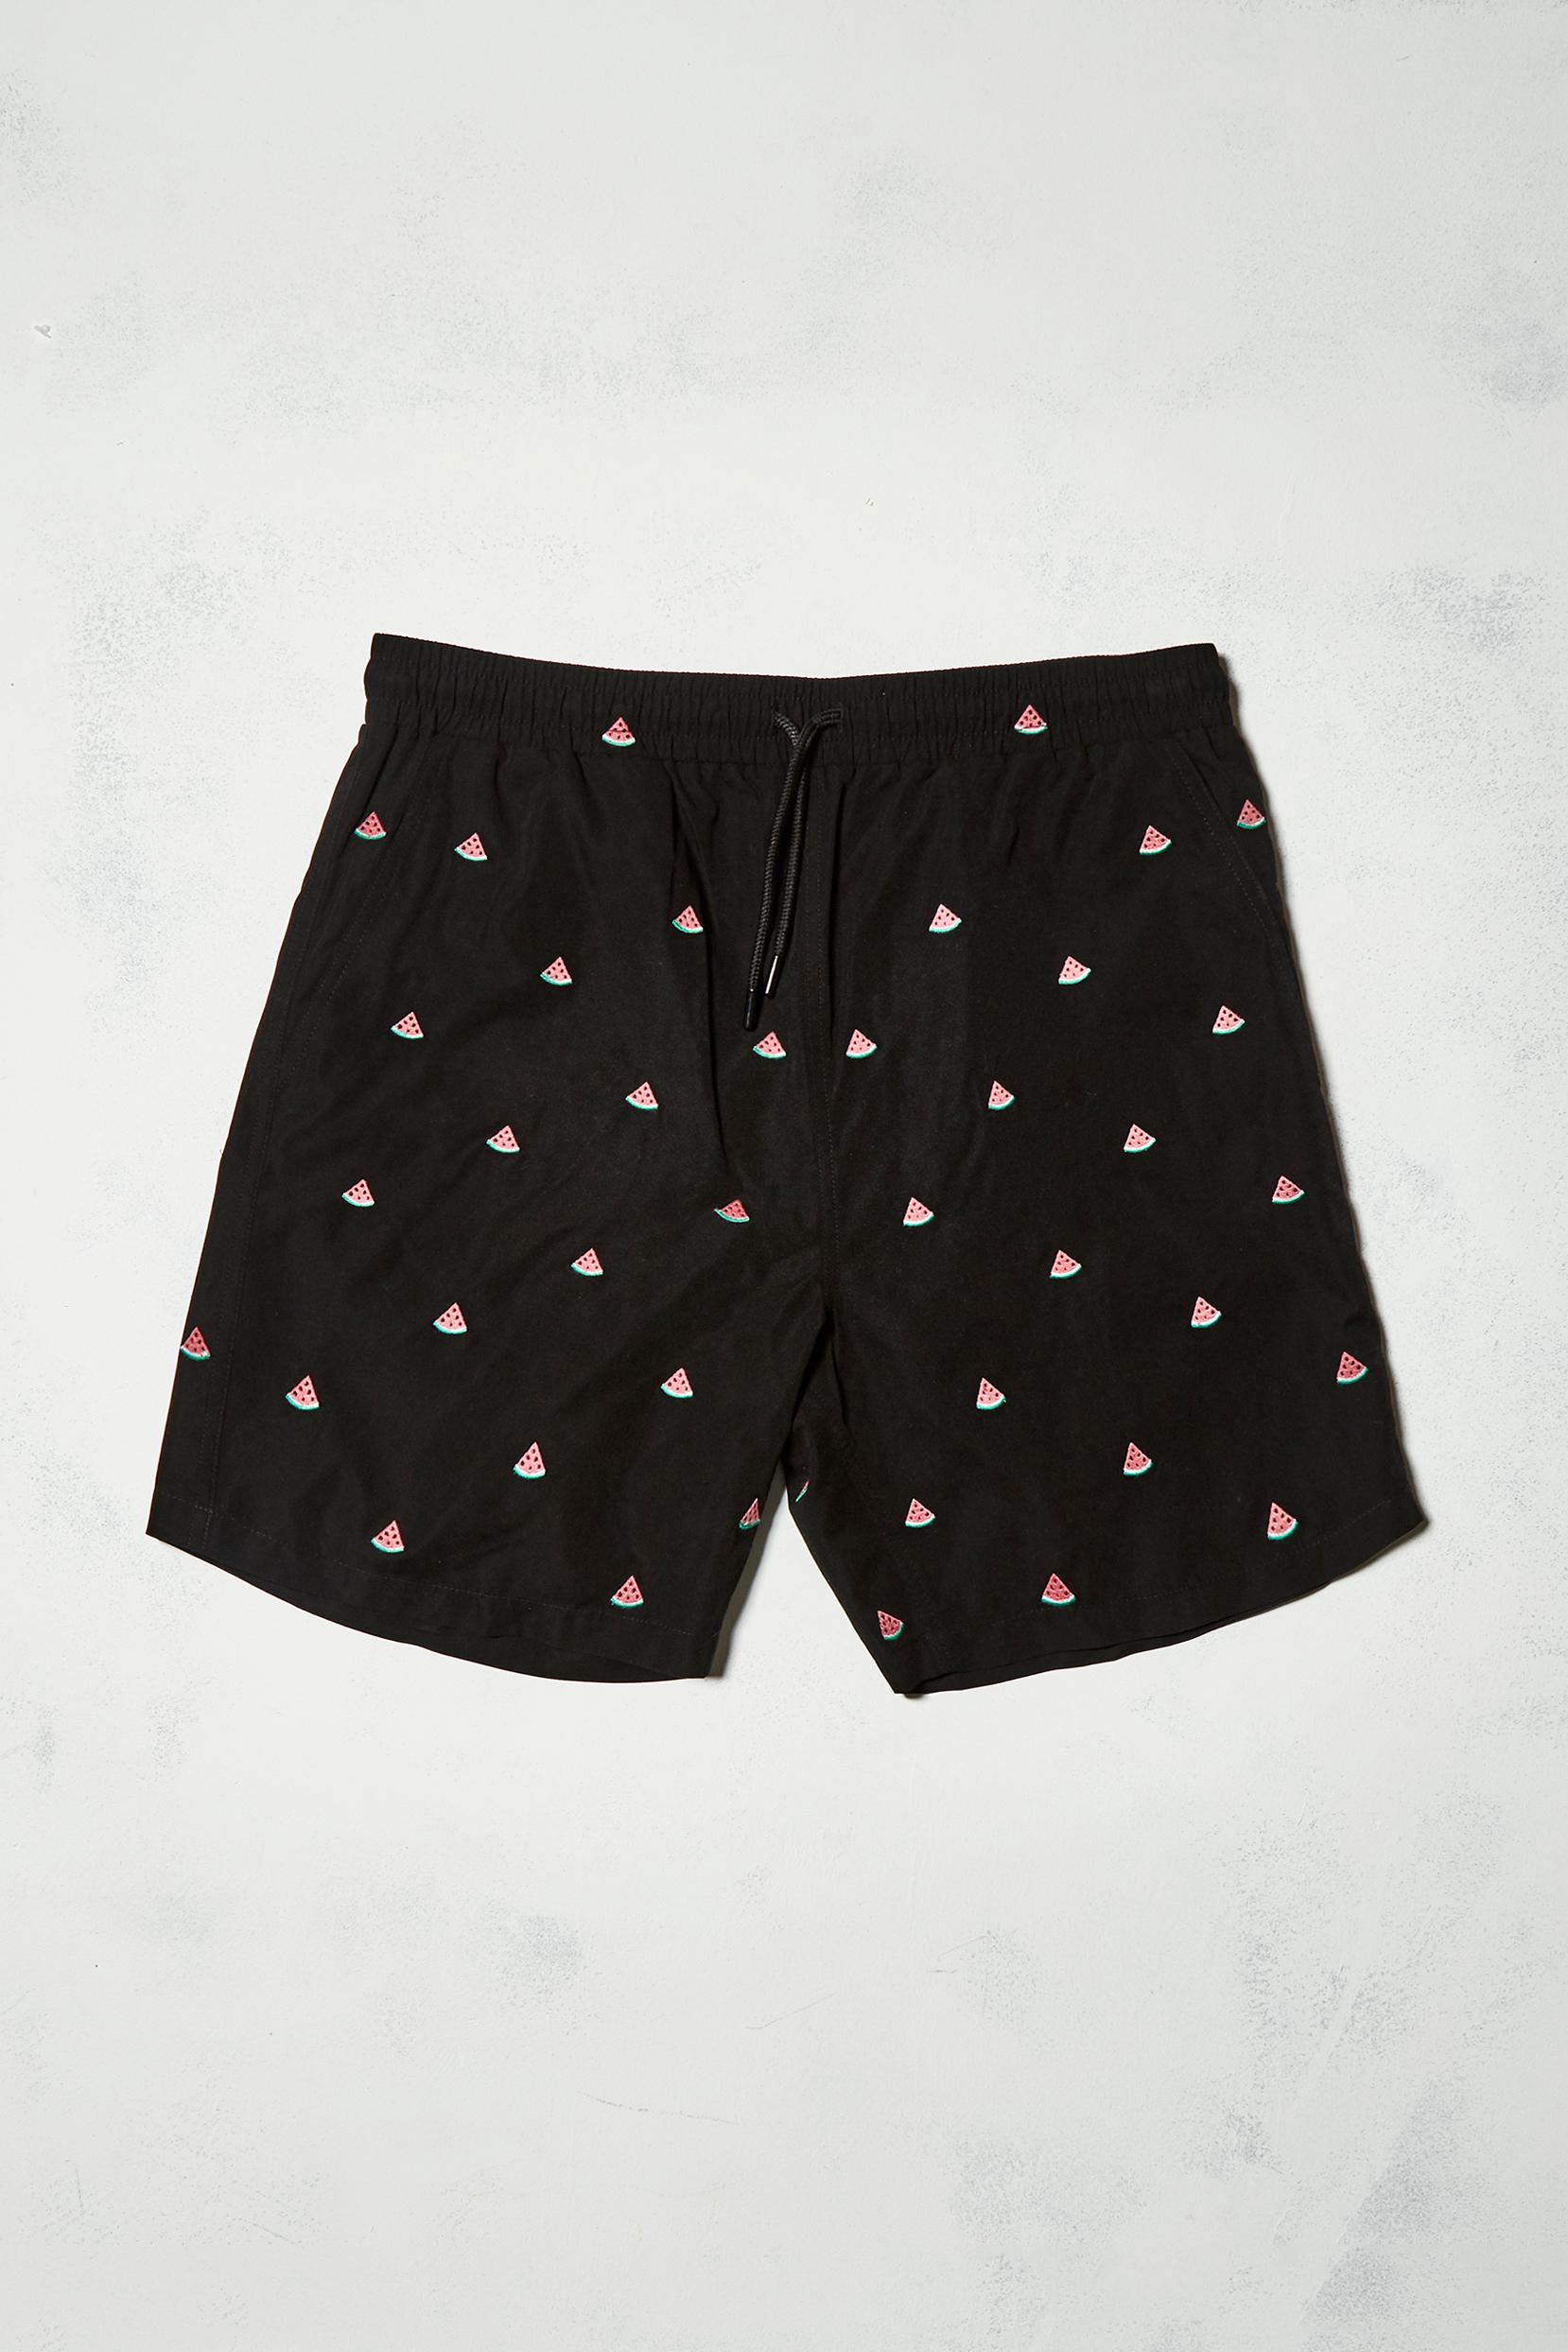 UO watermelon embroidered swim shorts - £32